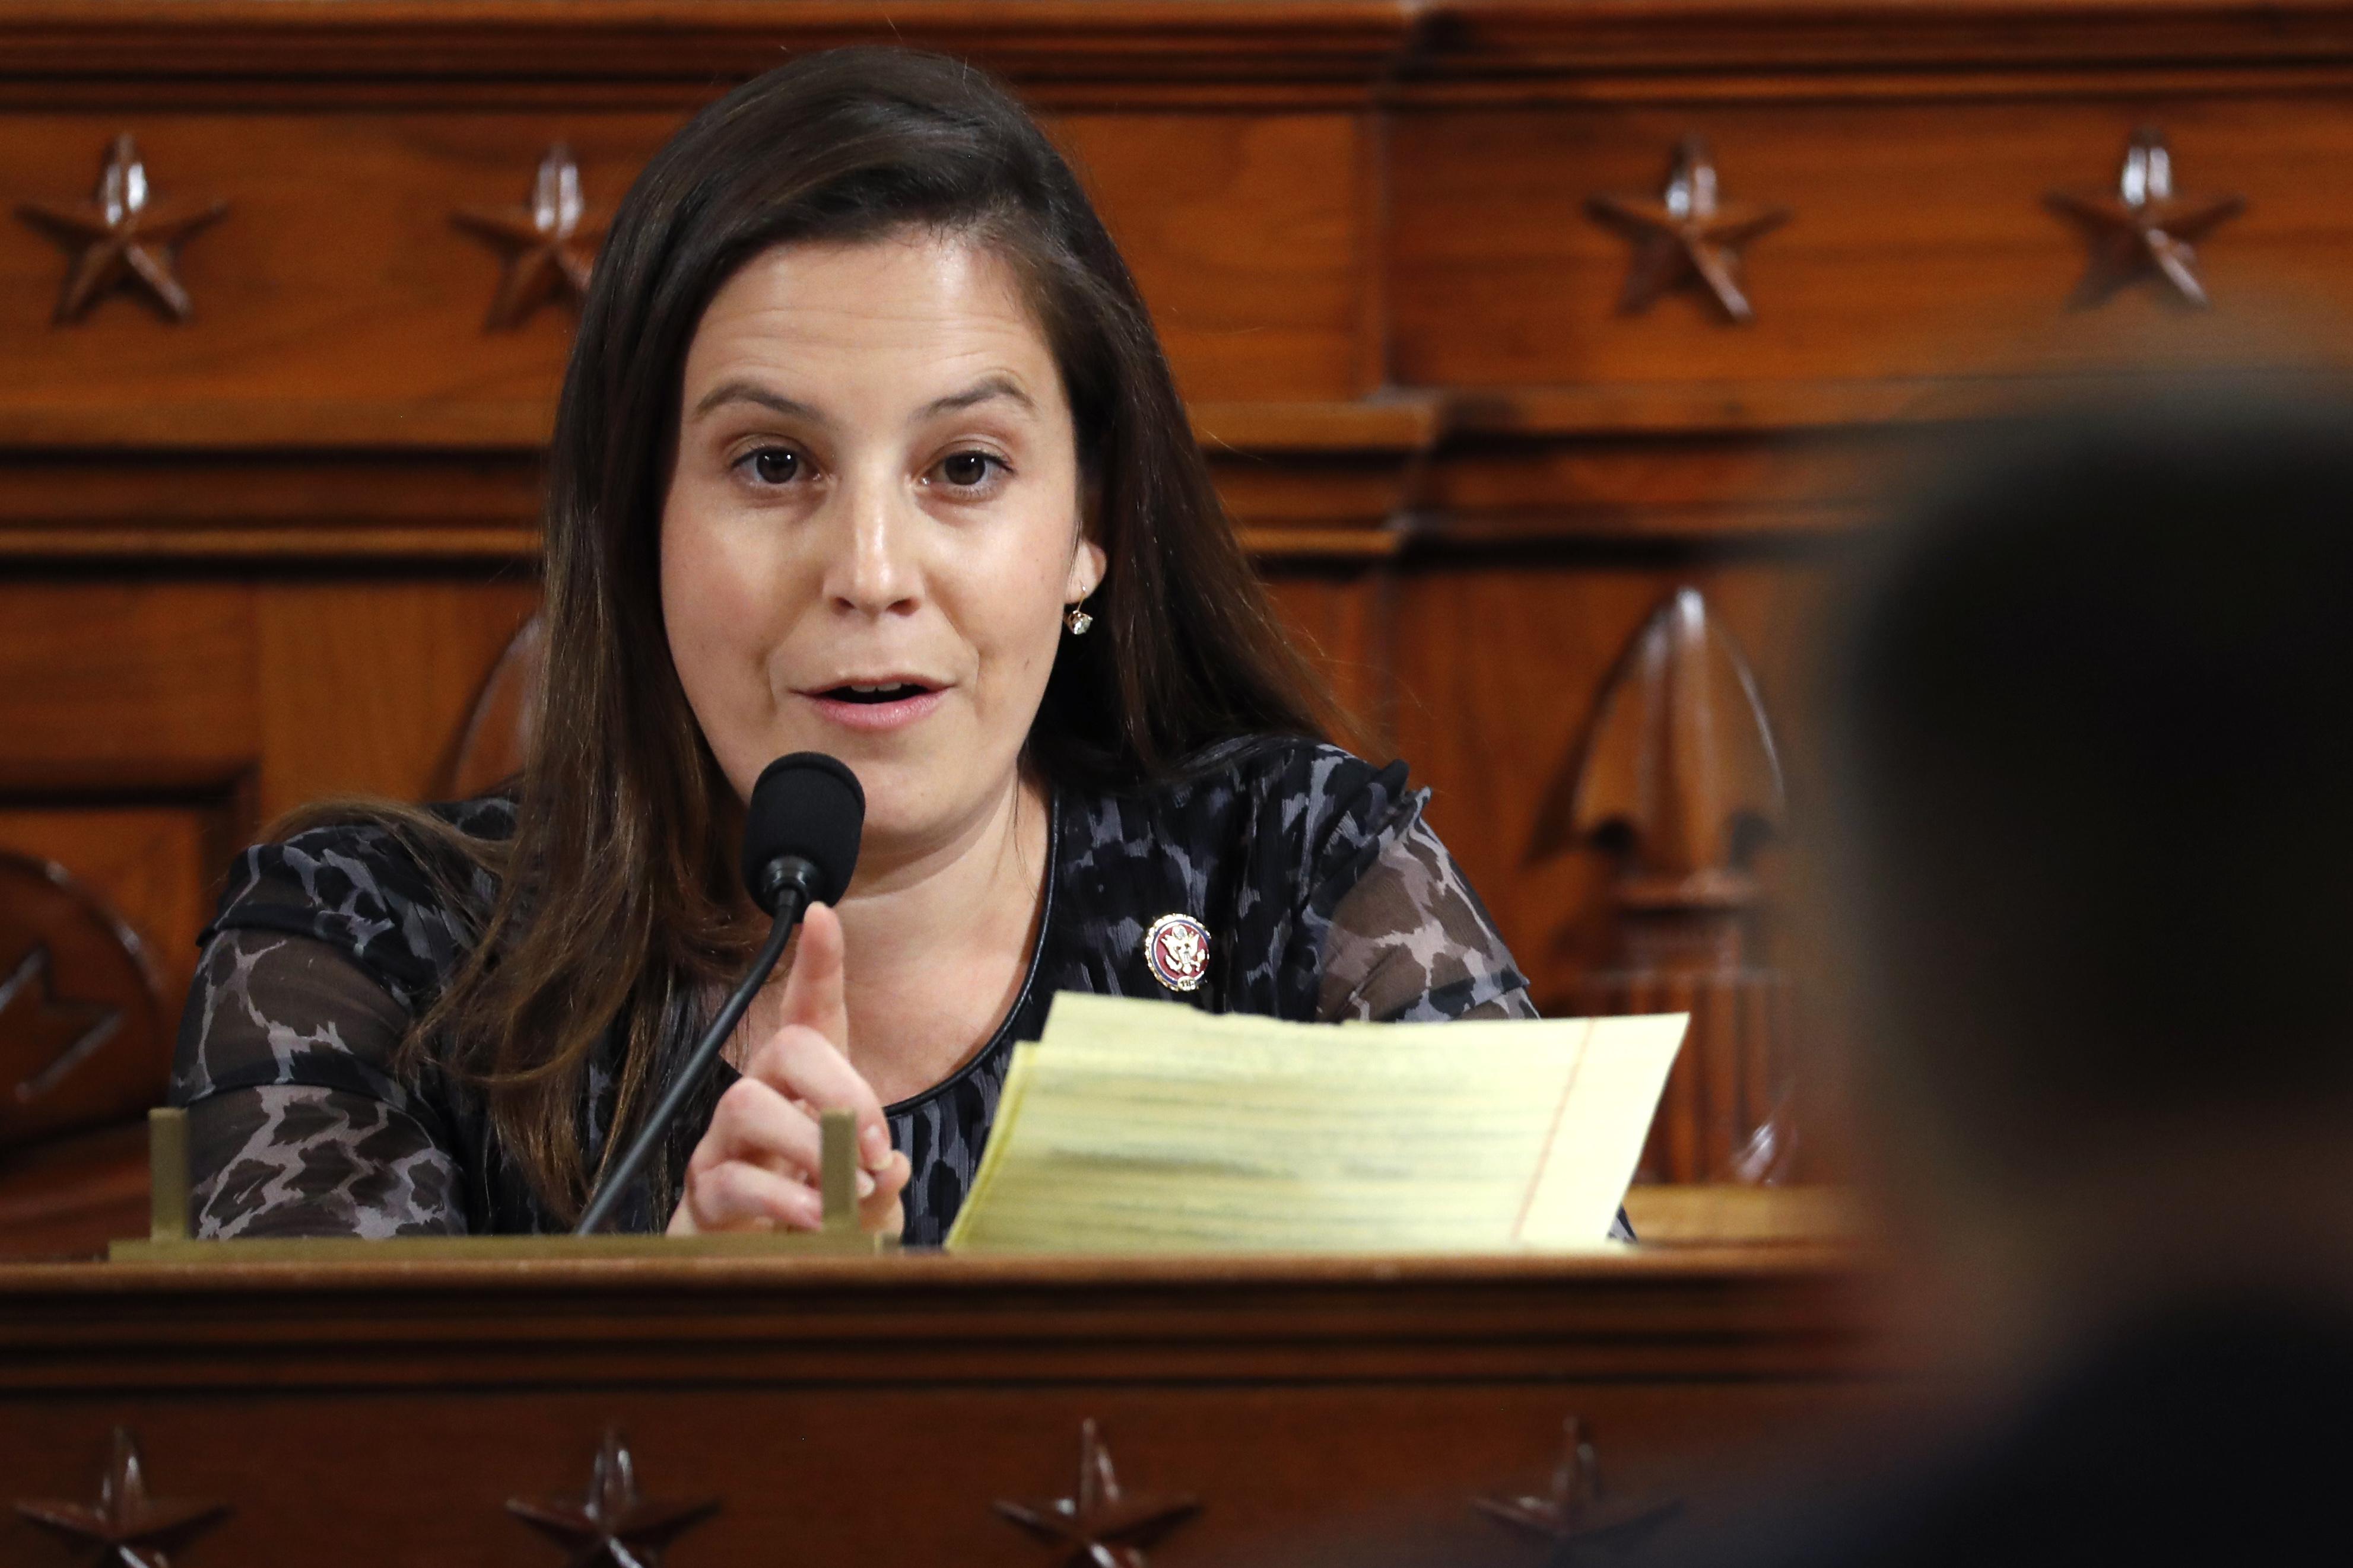 'A New Republican Star is born': Elise Stefanik rises amid impeachment drama